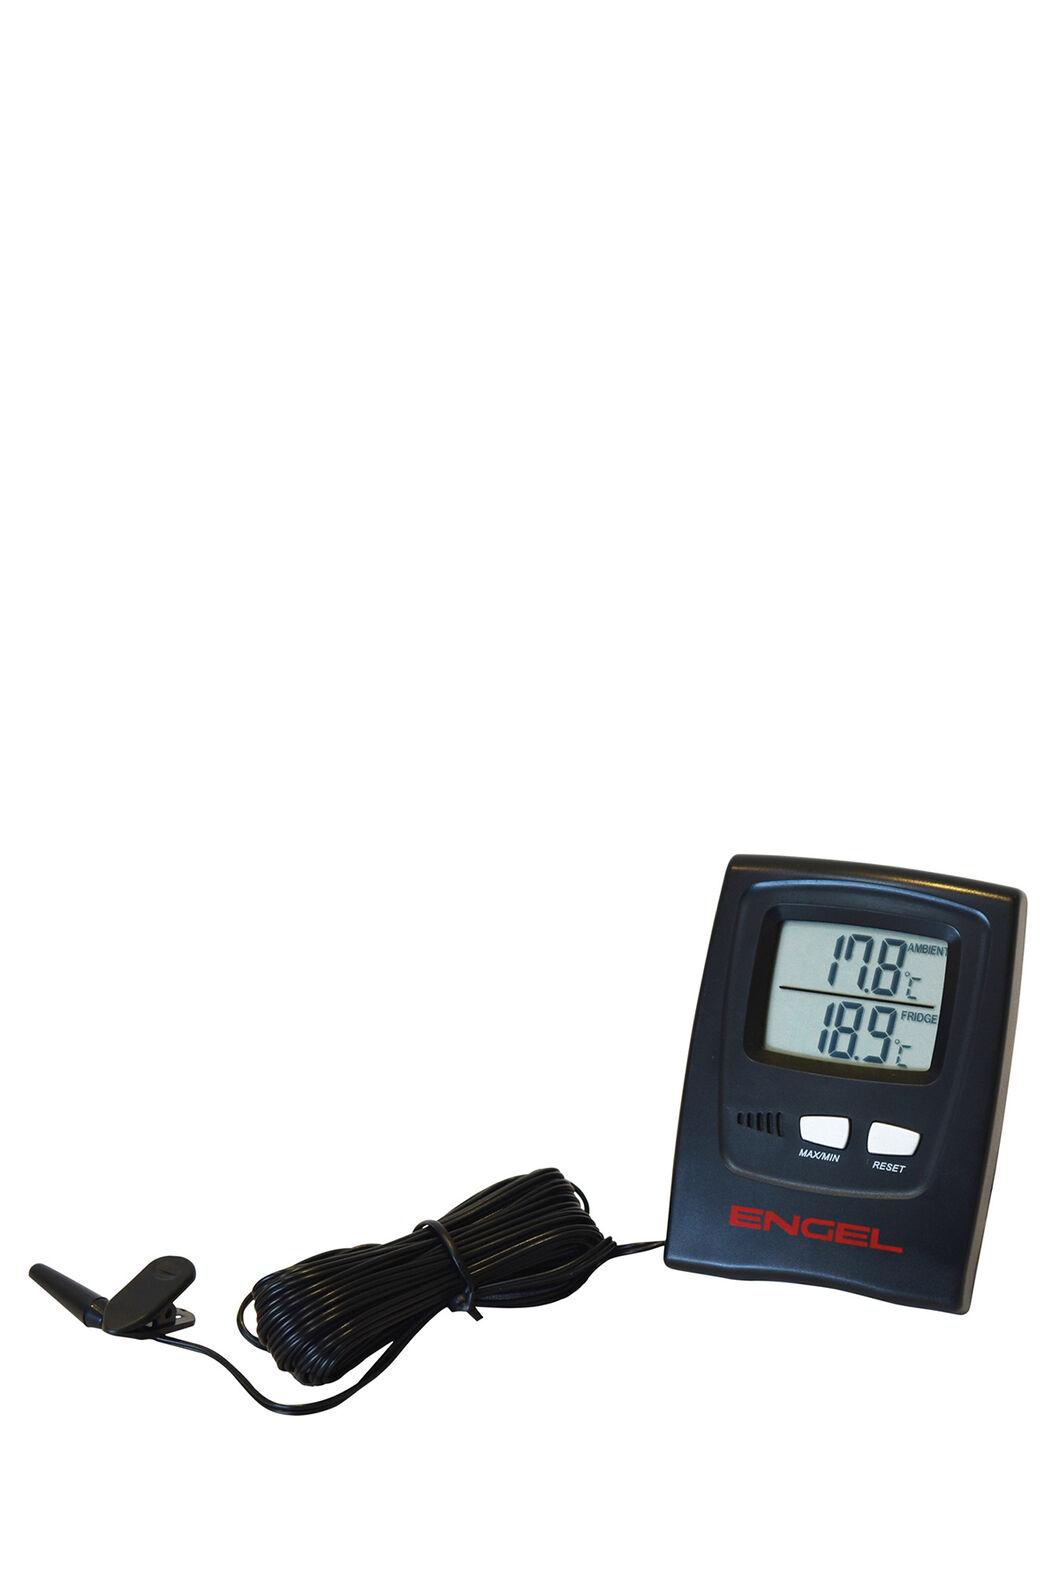 Engel Digital Fridge Thermometer, None, hi-res